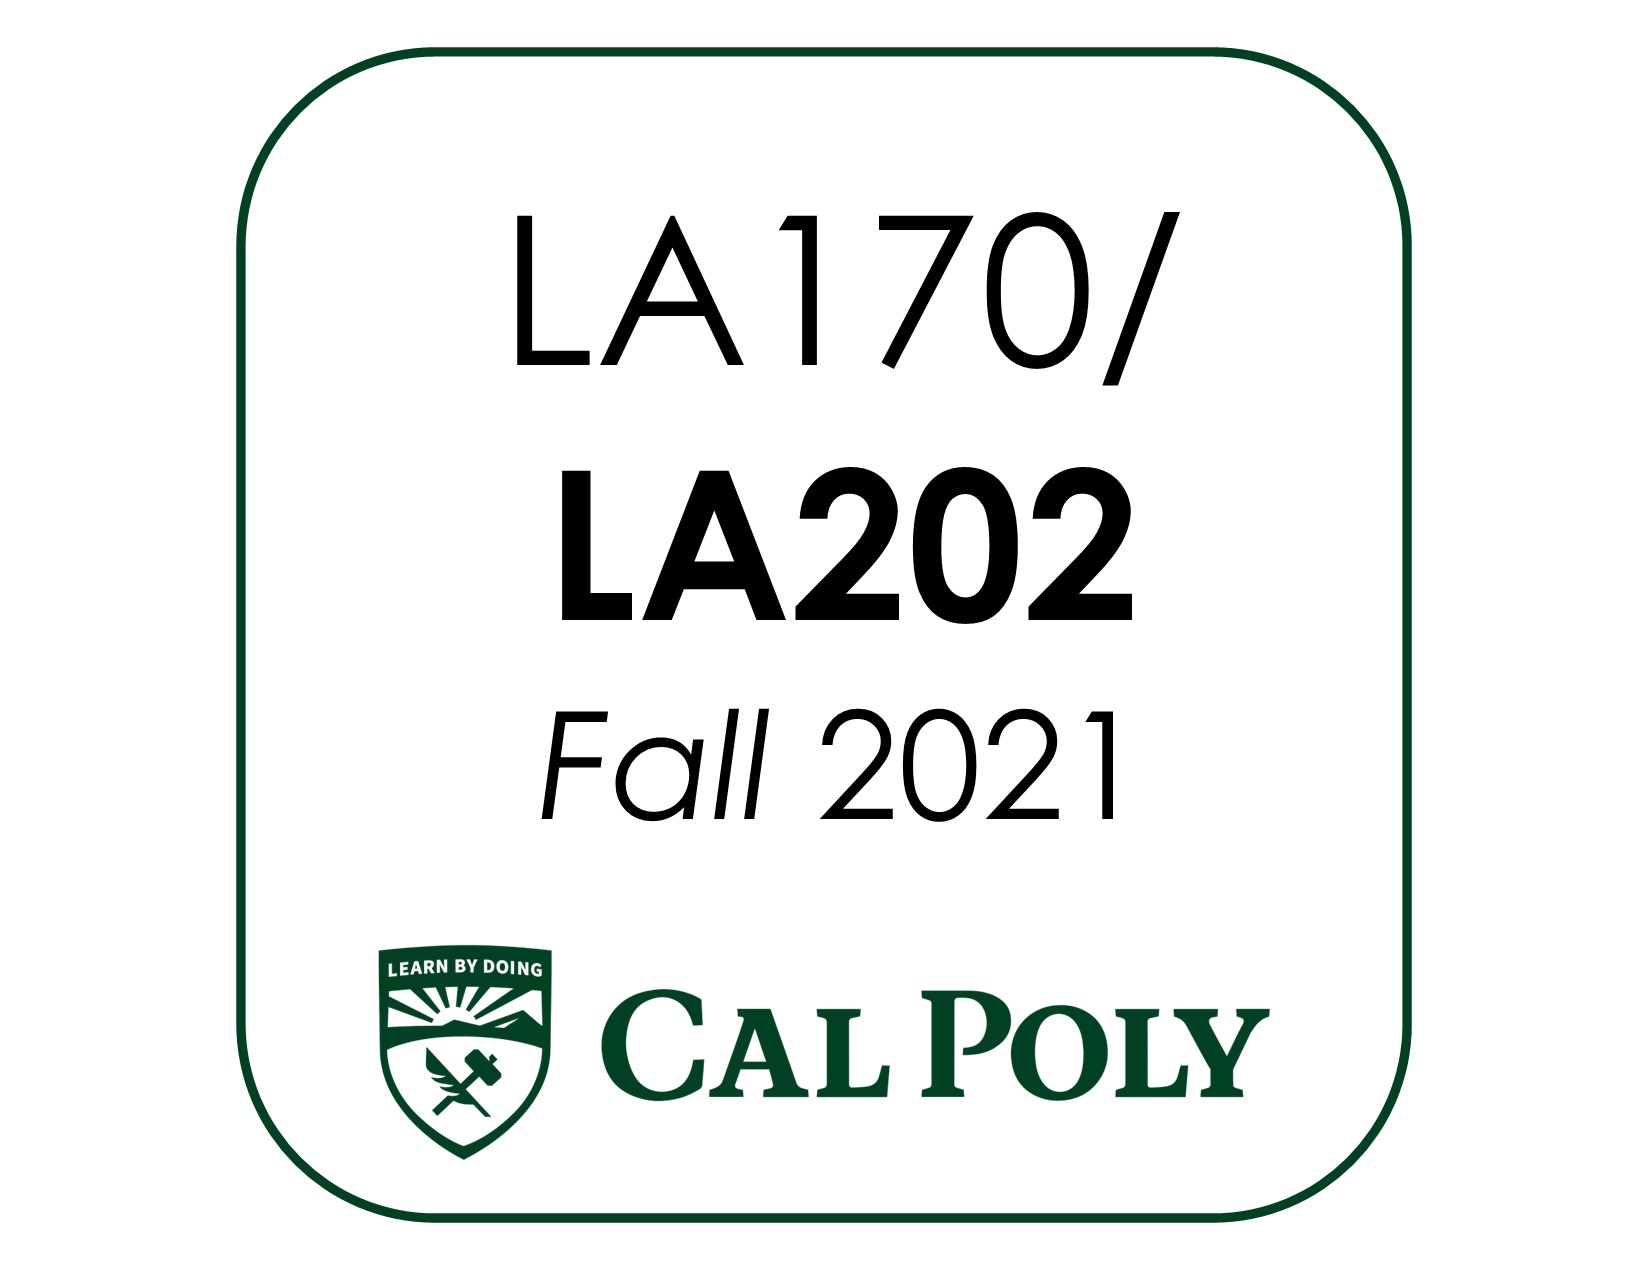 LA170-202 Kit image F2021